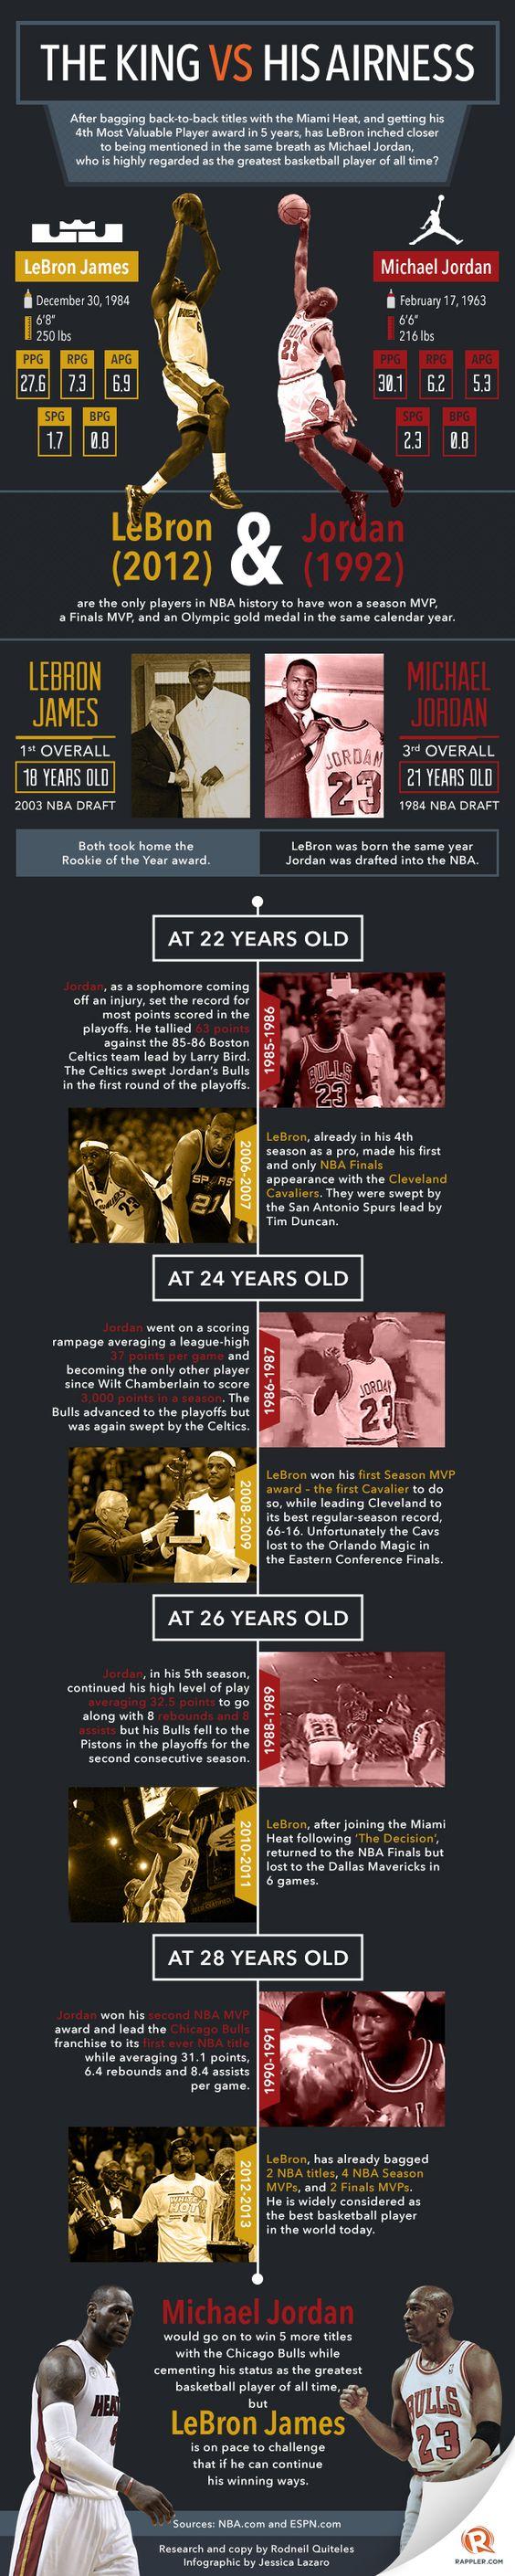 INFOGRAPHIC: LeBron vs Jordan